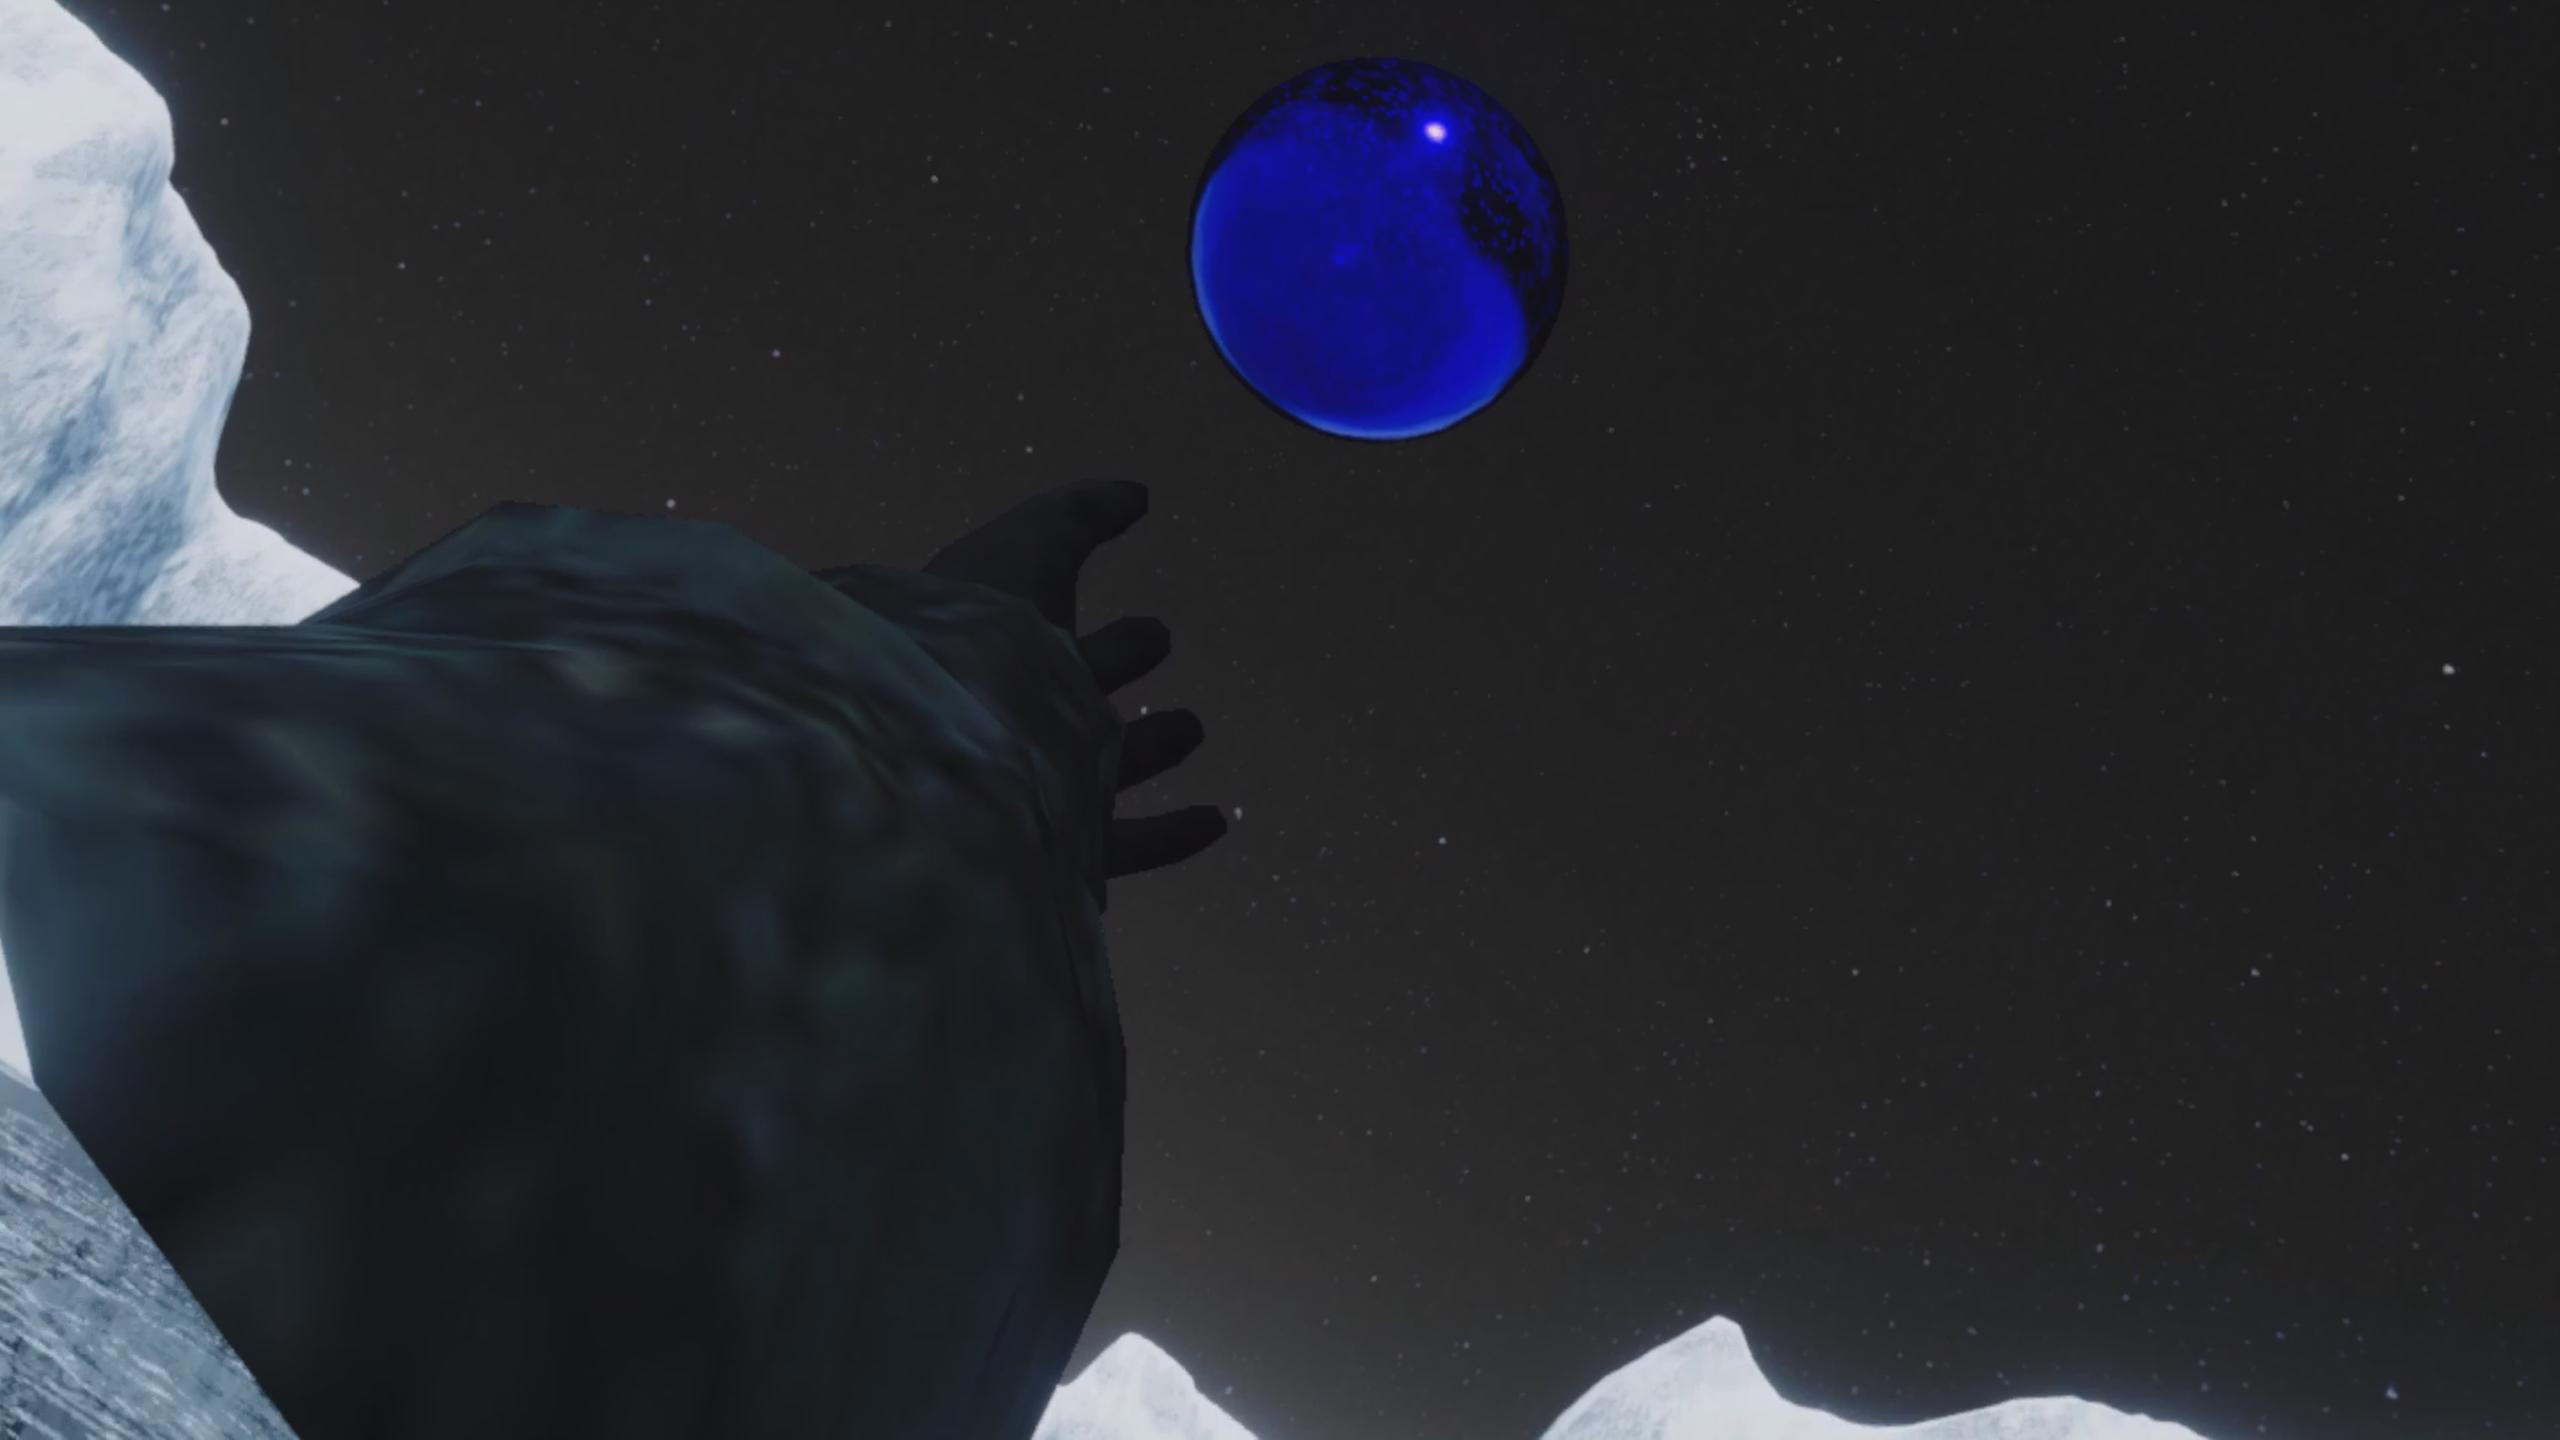 Hand grabbing blue orb